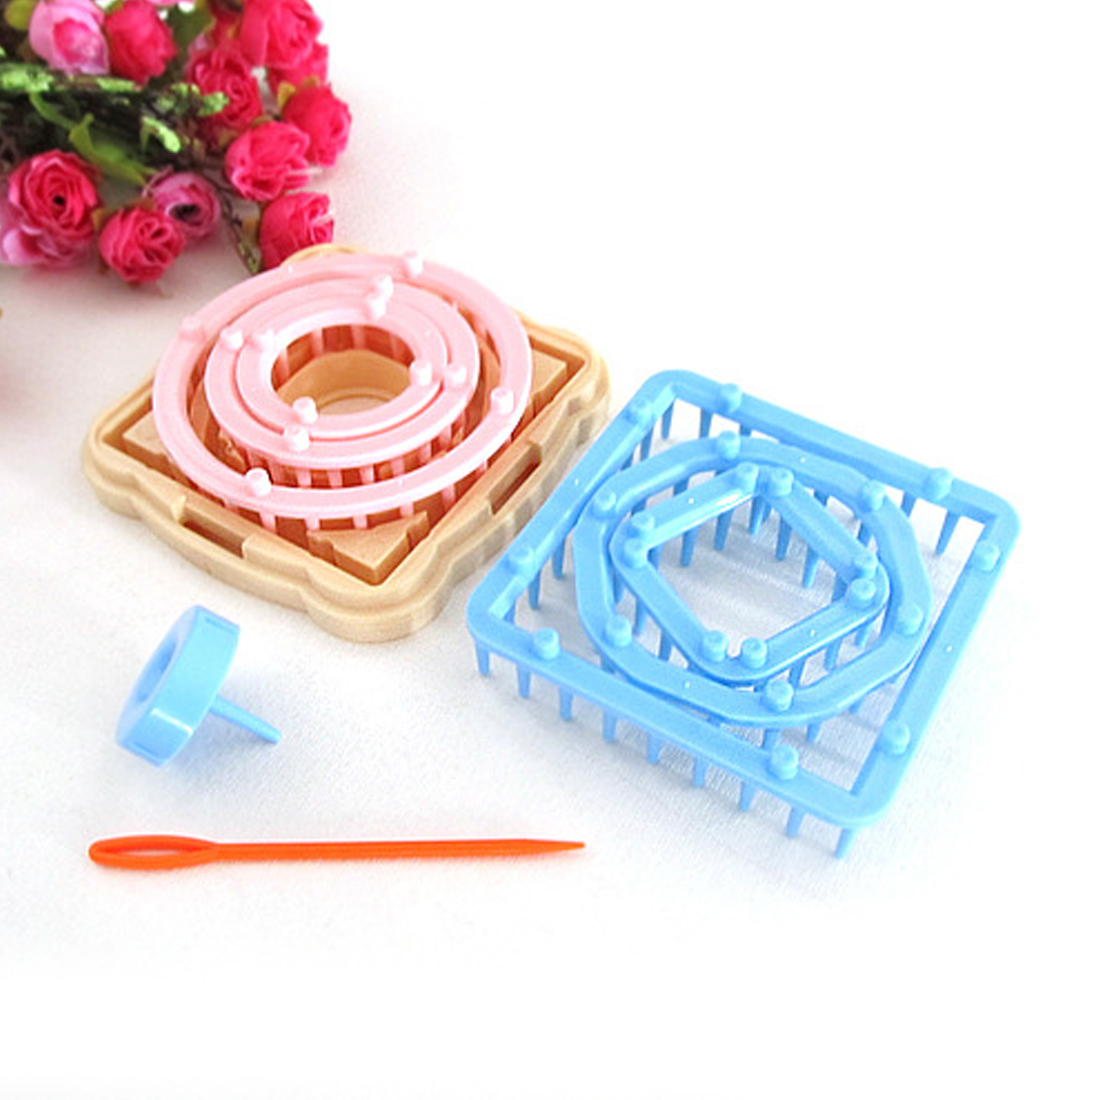 DIY Weaving Tools Creator Yarn Needle Hobby Loom Knitting Machine Color Stitching Tools Flower Loom Knitting Woolen